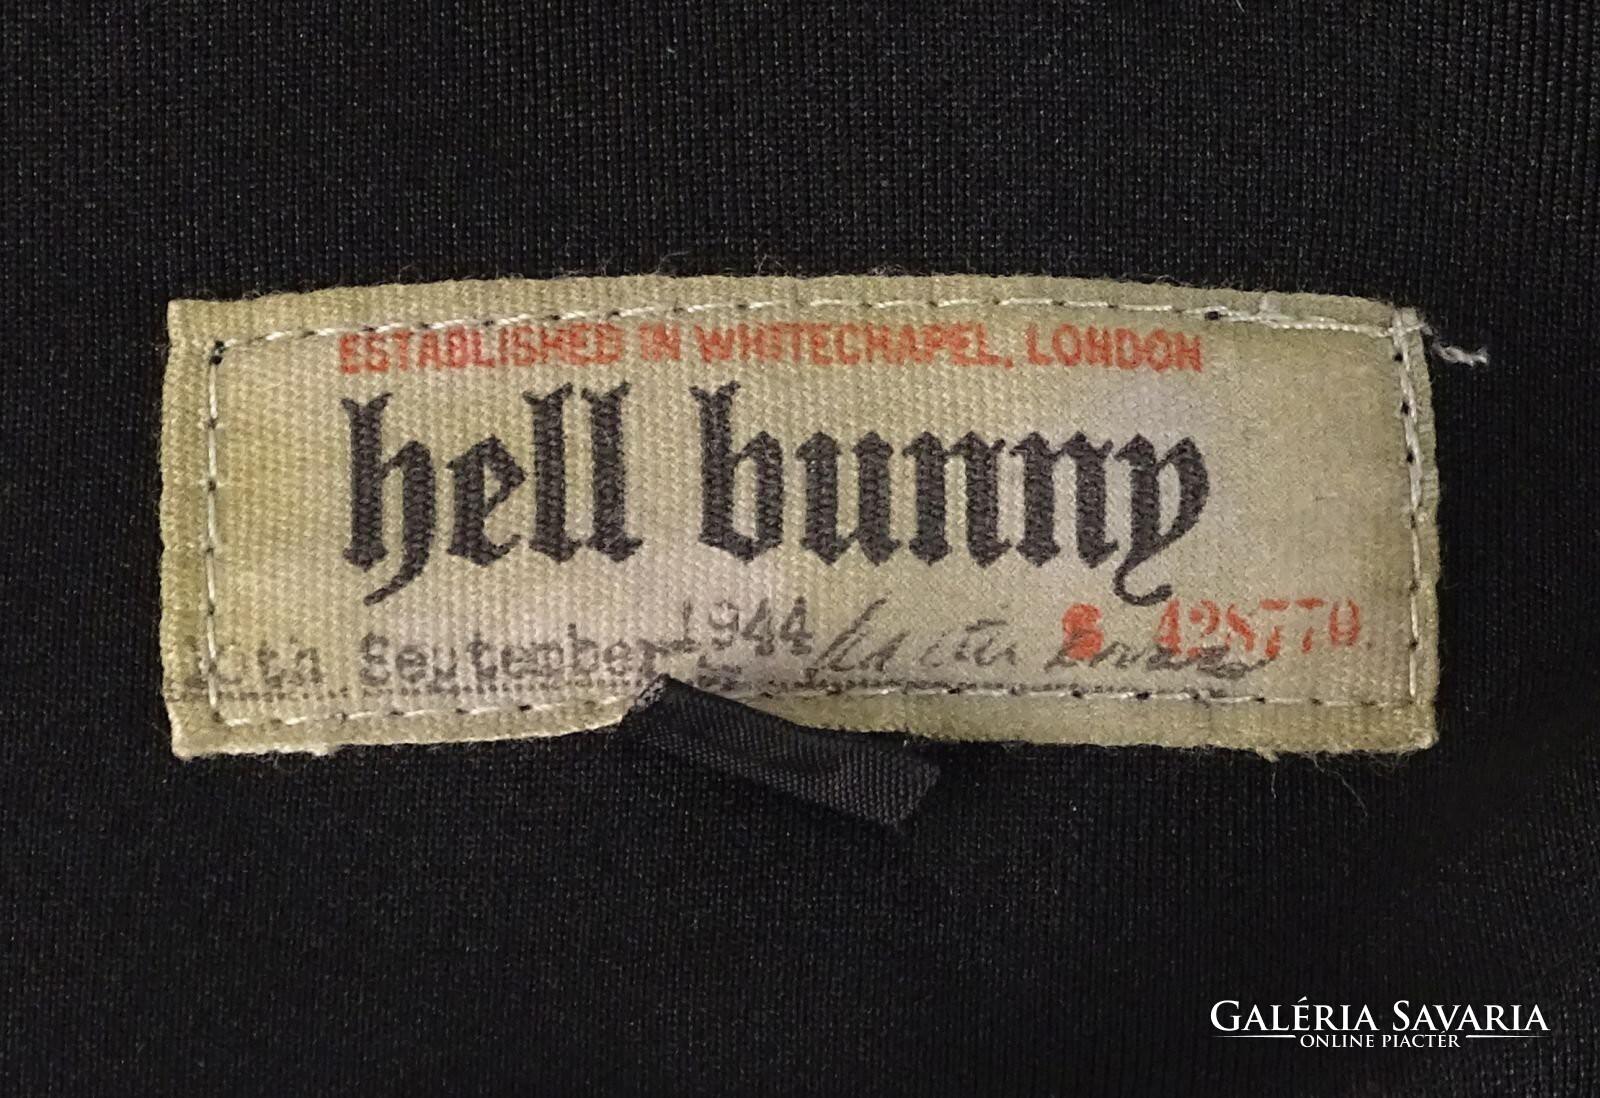 0V804 Fekete Hell Bunny ceruzaszoknya Gardrób | Galéria